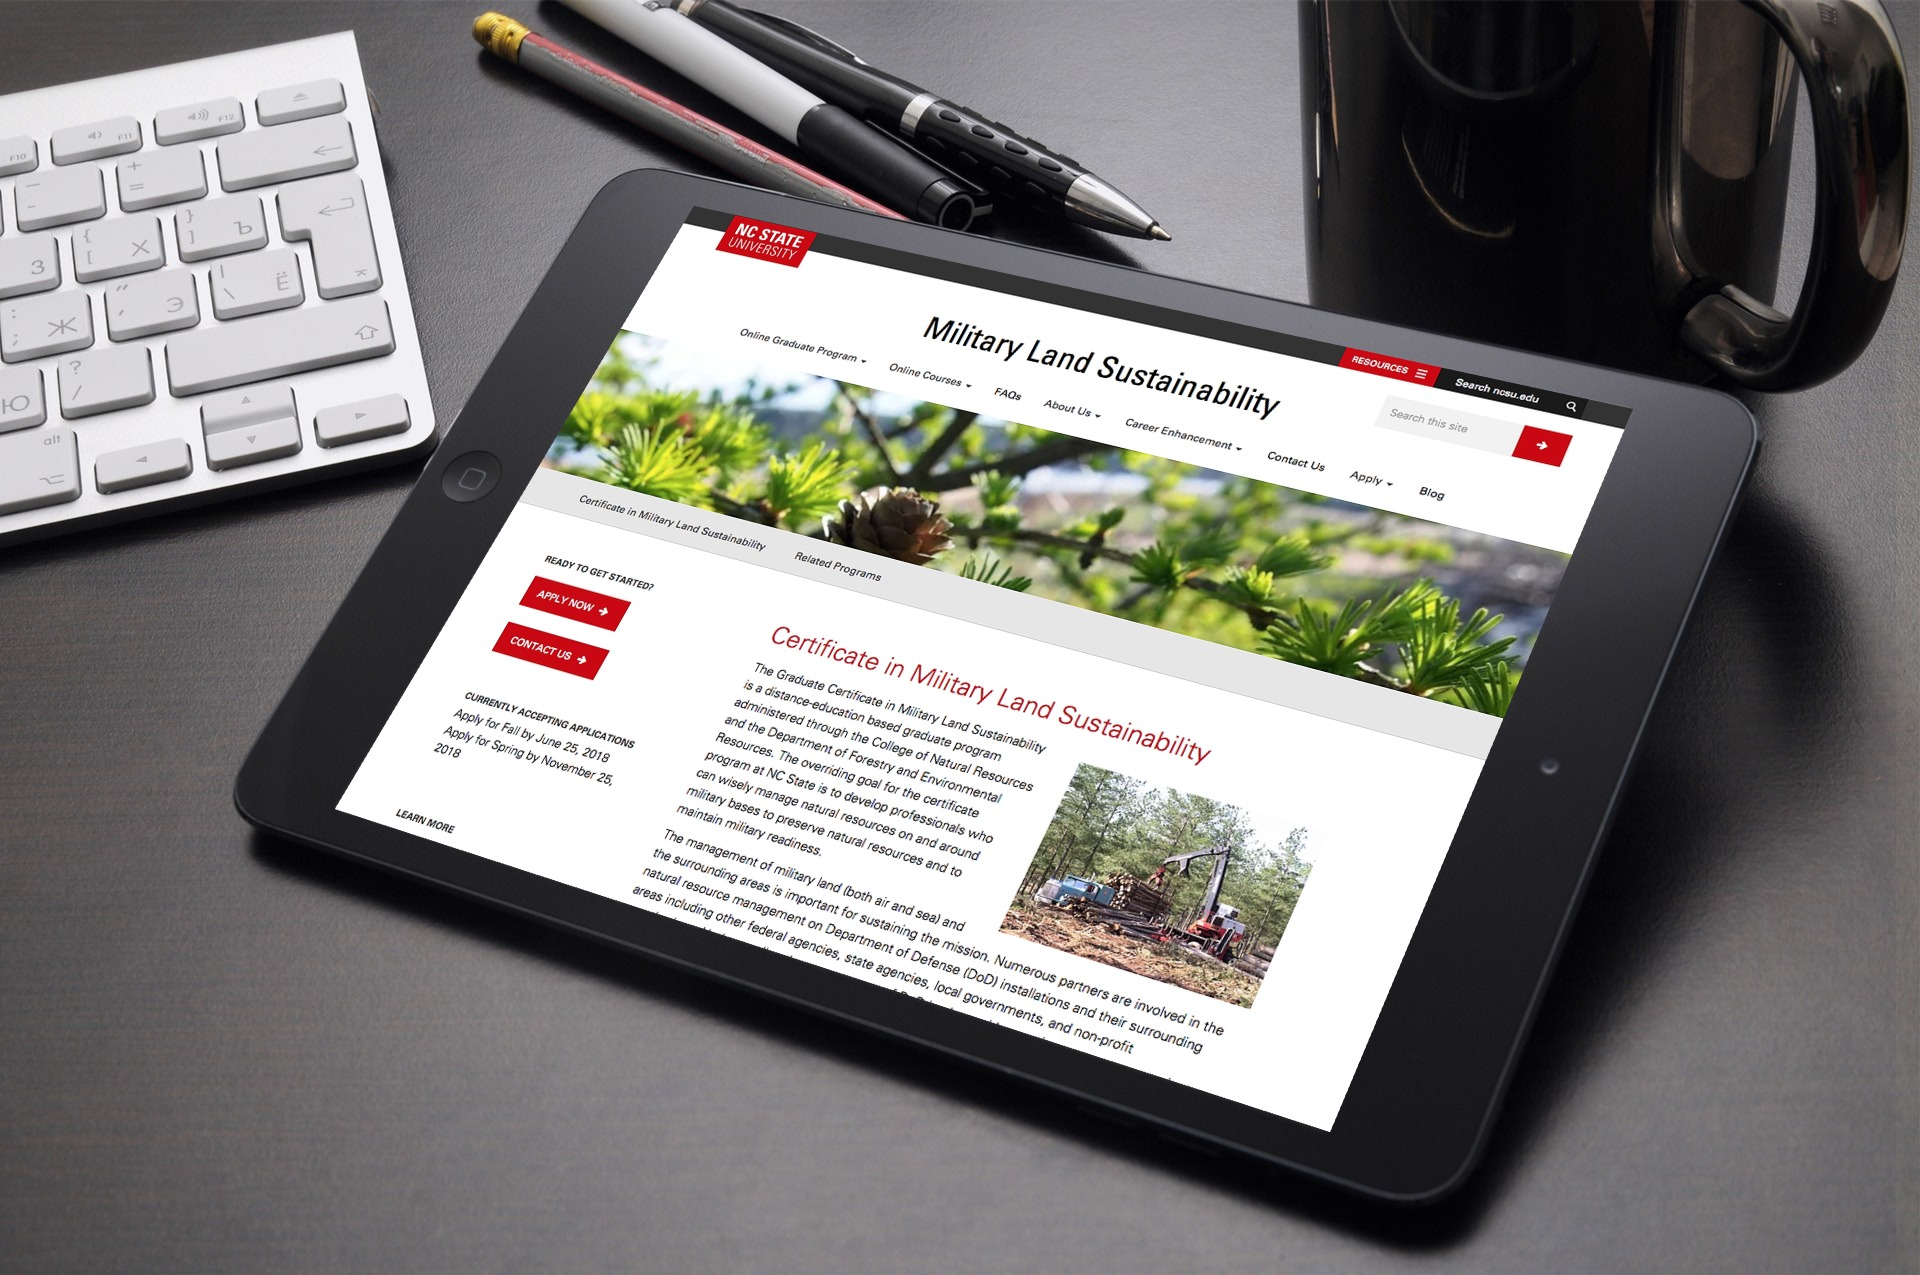 NCSU tablet smartmockups_jkoh8lix